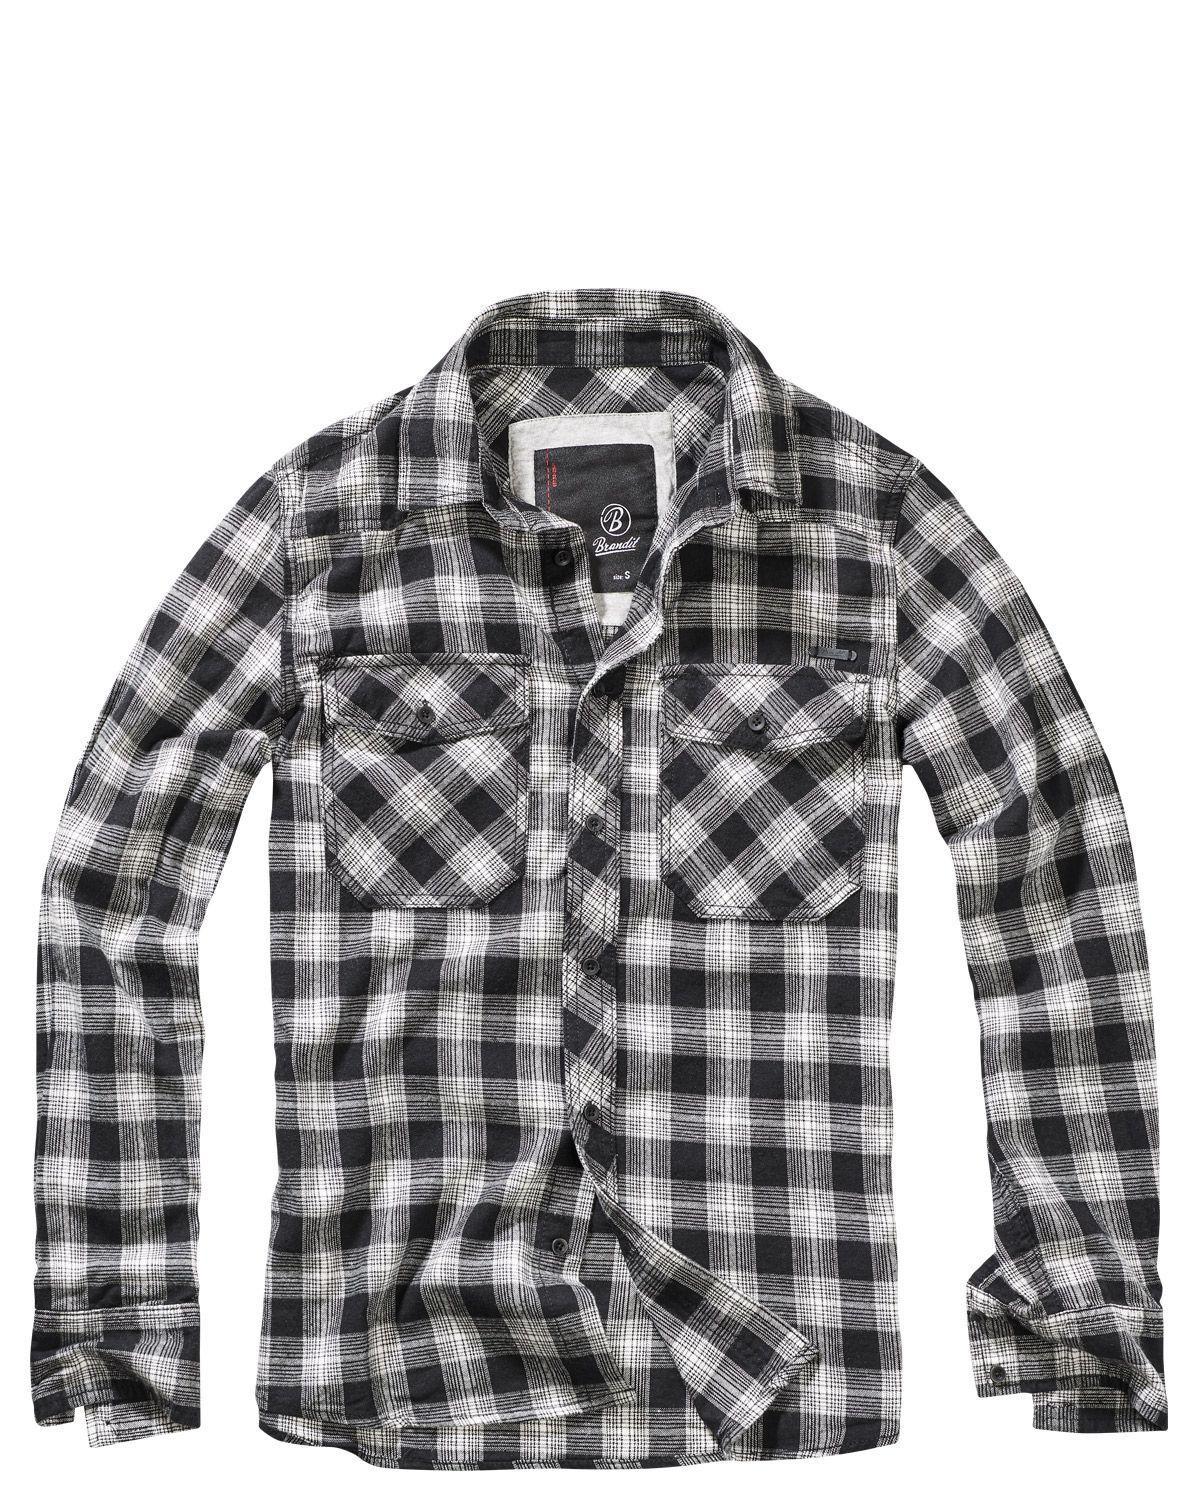 Image of   Brandit Great Creek Skjorte (Sort / Off-white, 2XL)